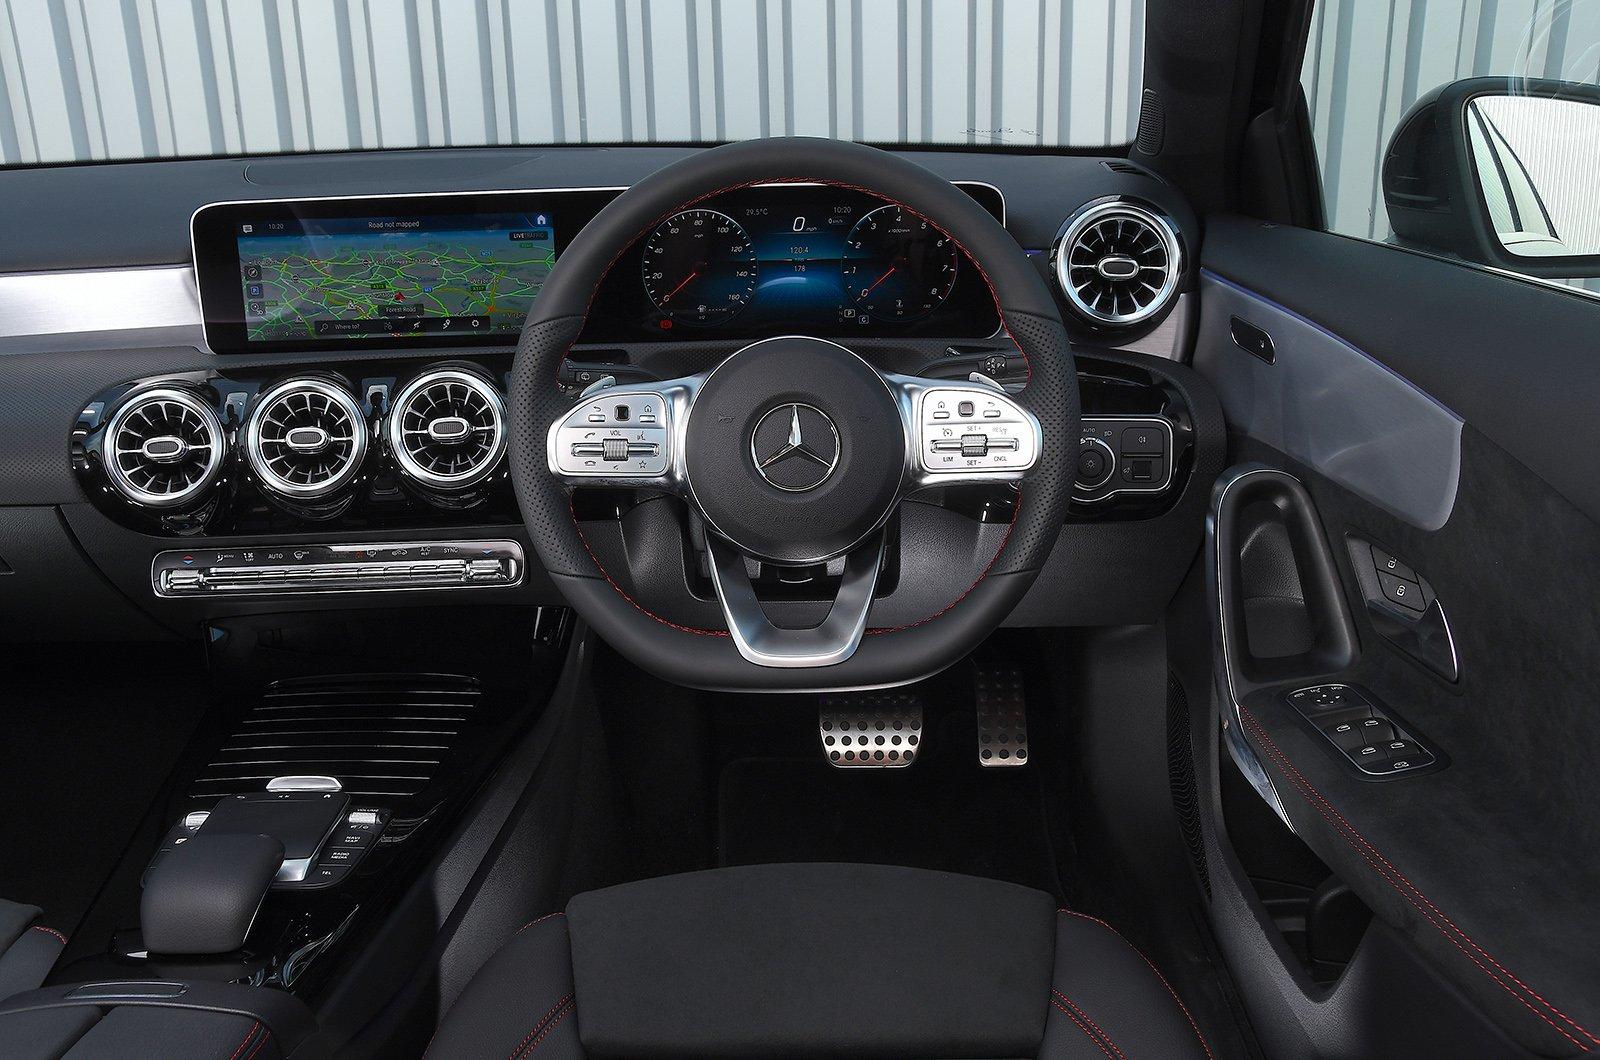 Mercedes A-Class dash